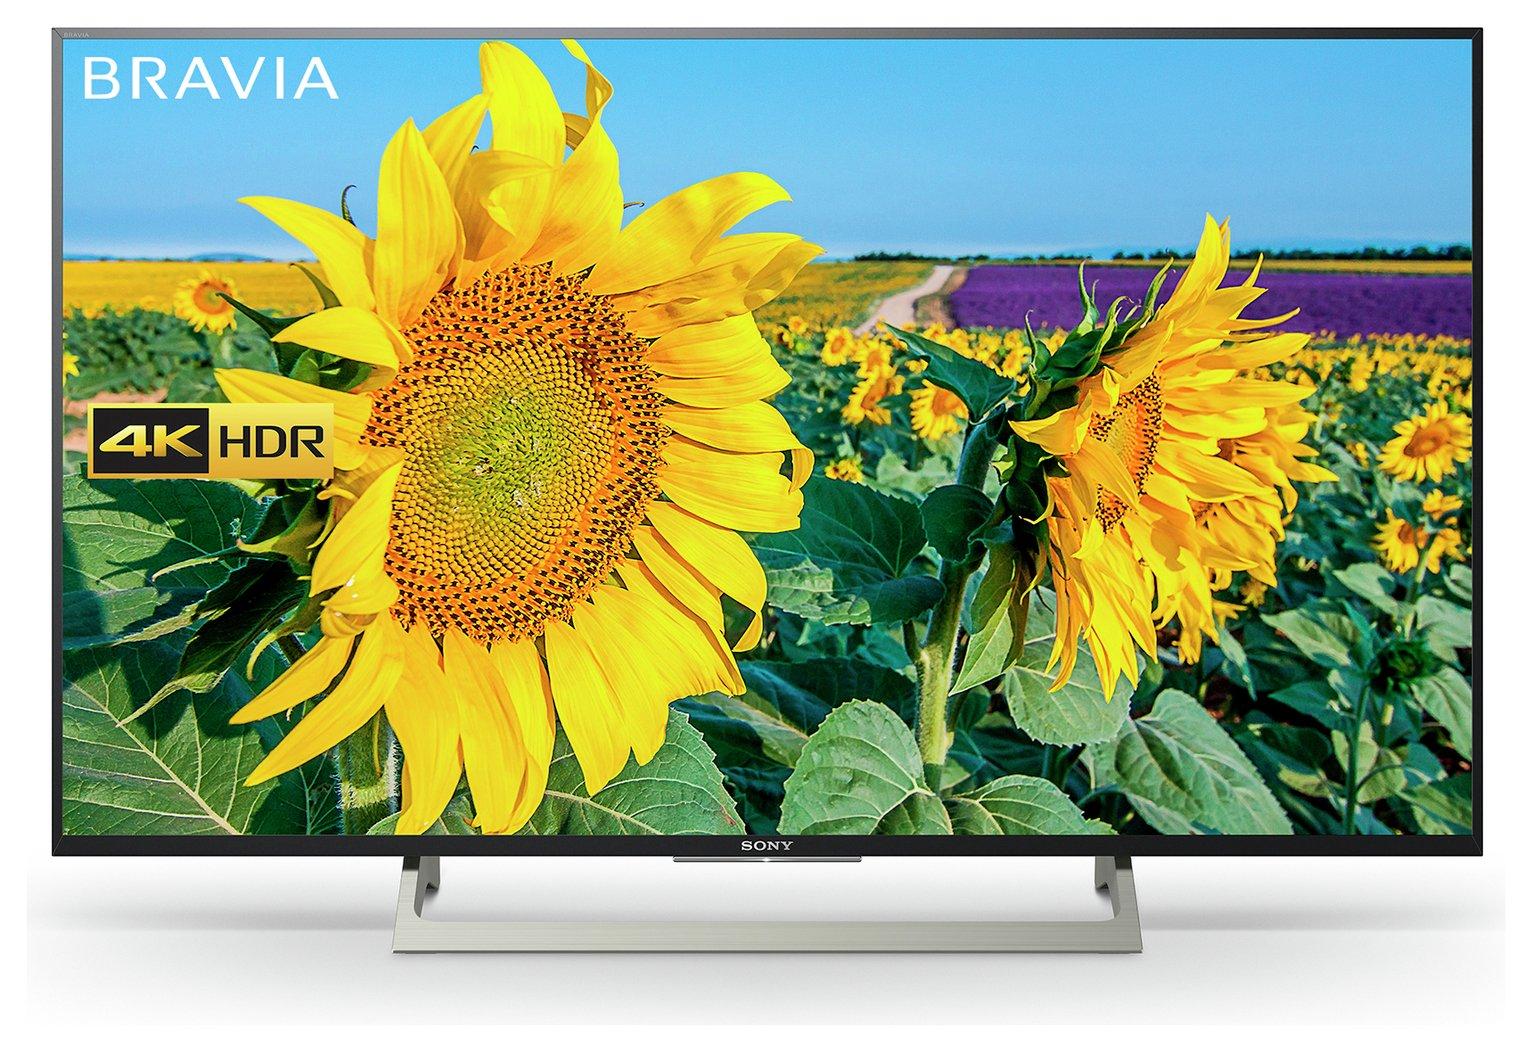 Sony Sony 43 Inch KD43XF8096BU Smart 4K Ultra HD TV with HDR